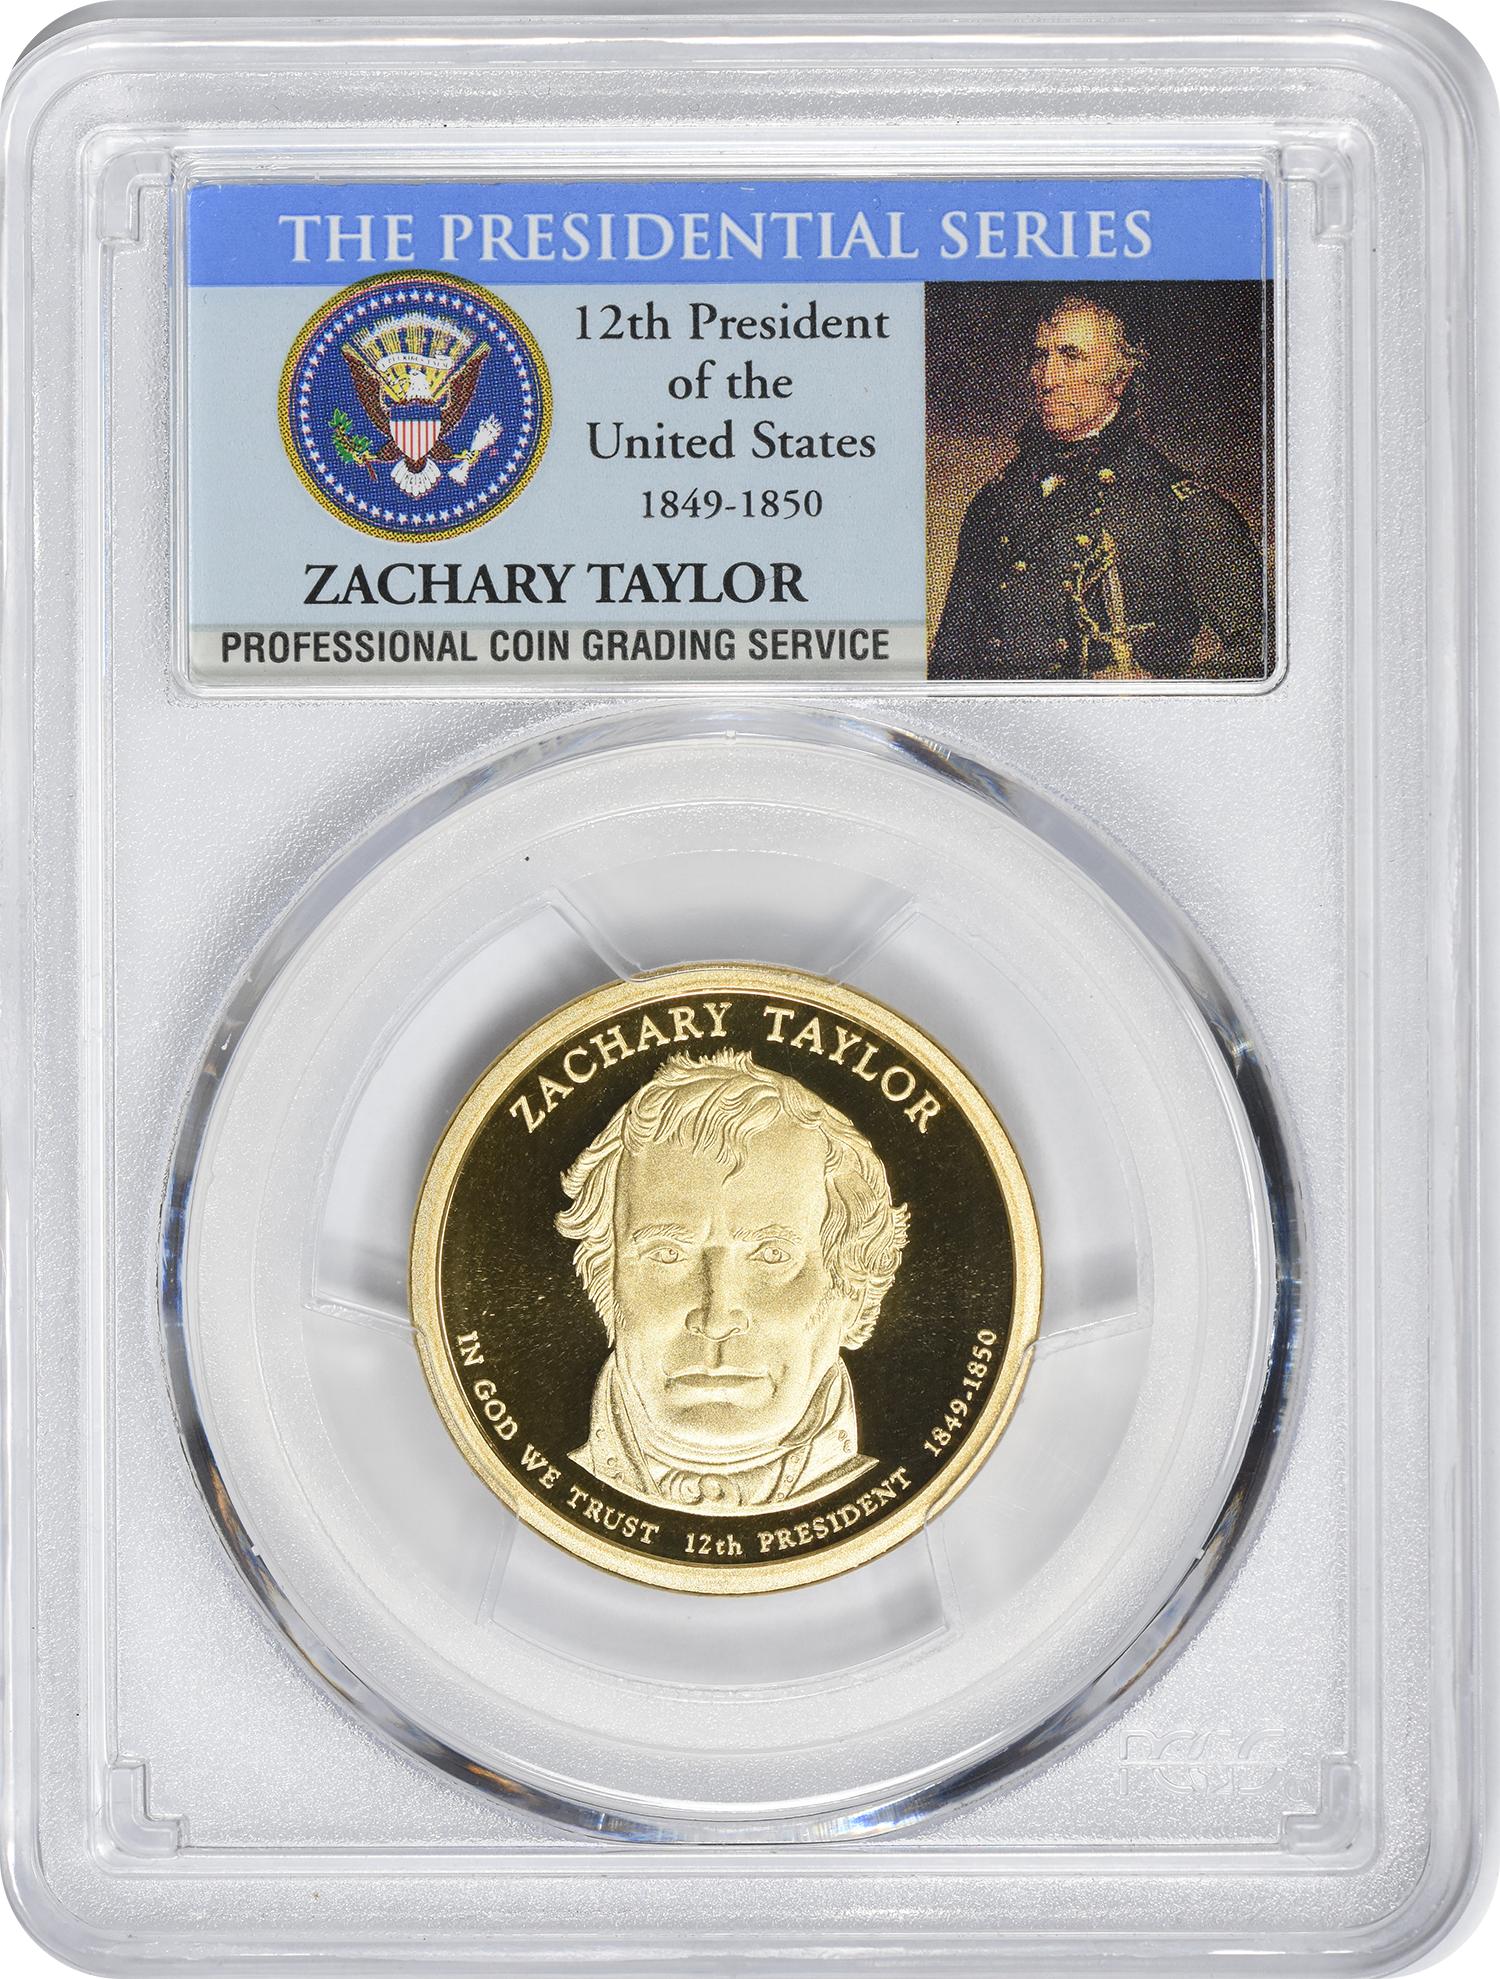 2009-S Zachary Taylor Presidential Dollar PR70DCAM PCGS